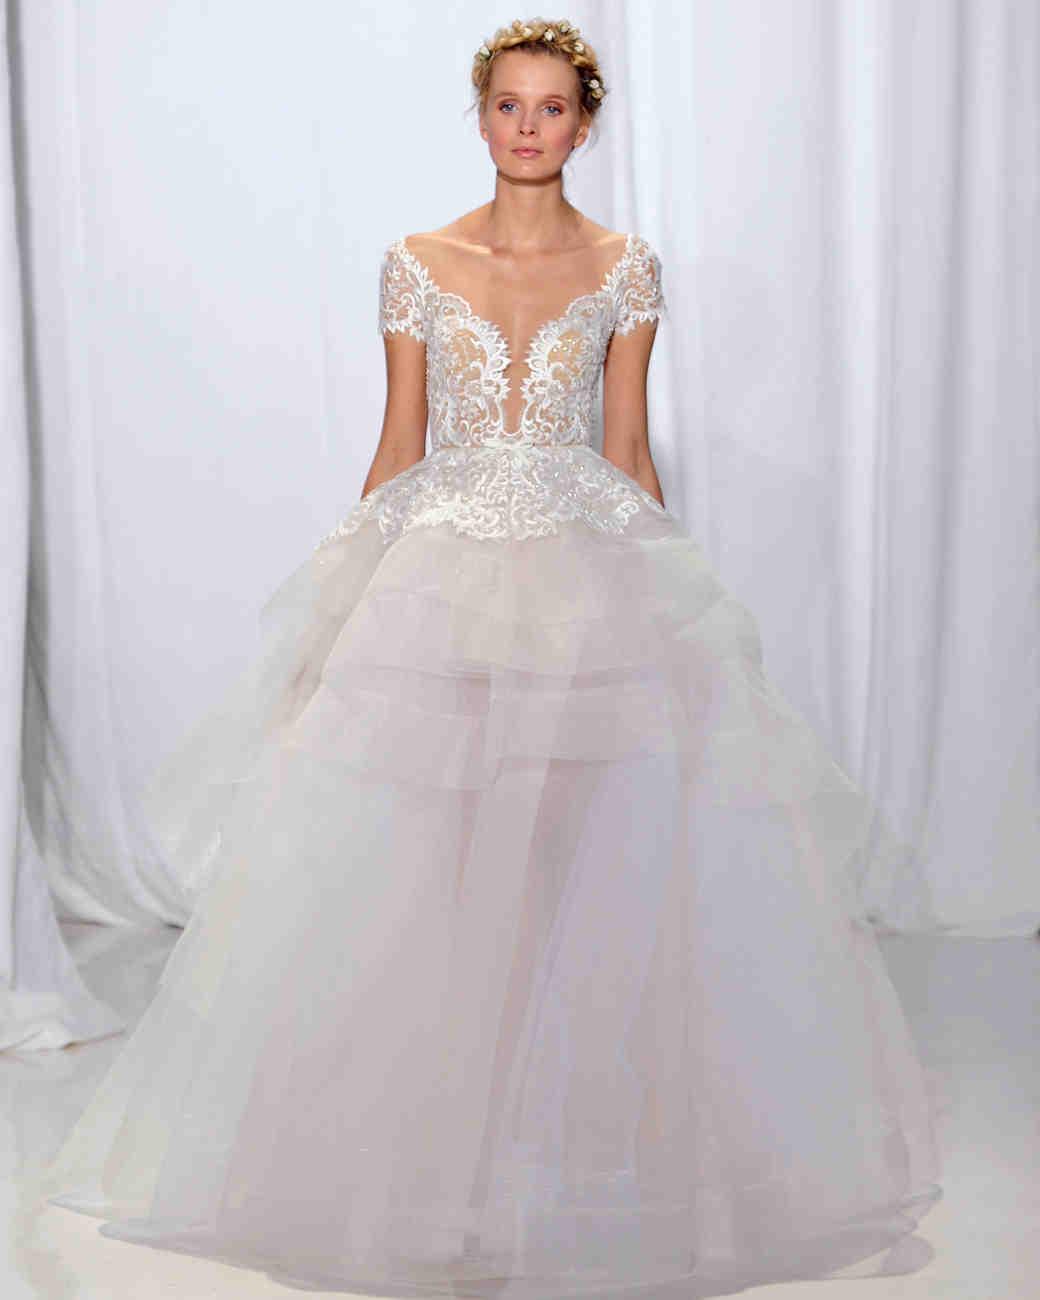 Reem Acra Fall 2017 Wedding Dress Collection